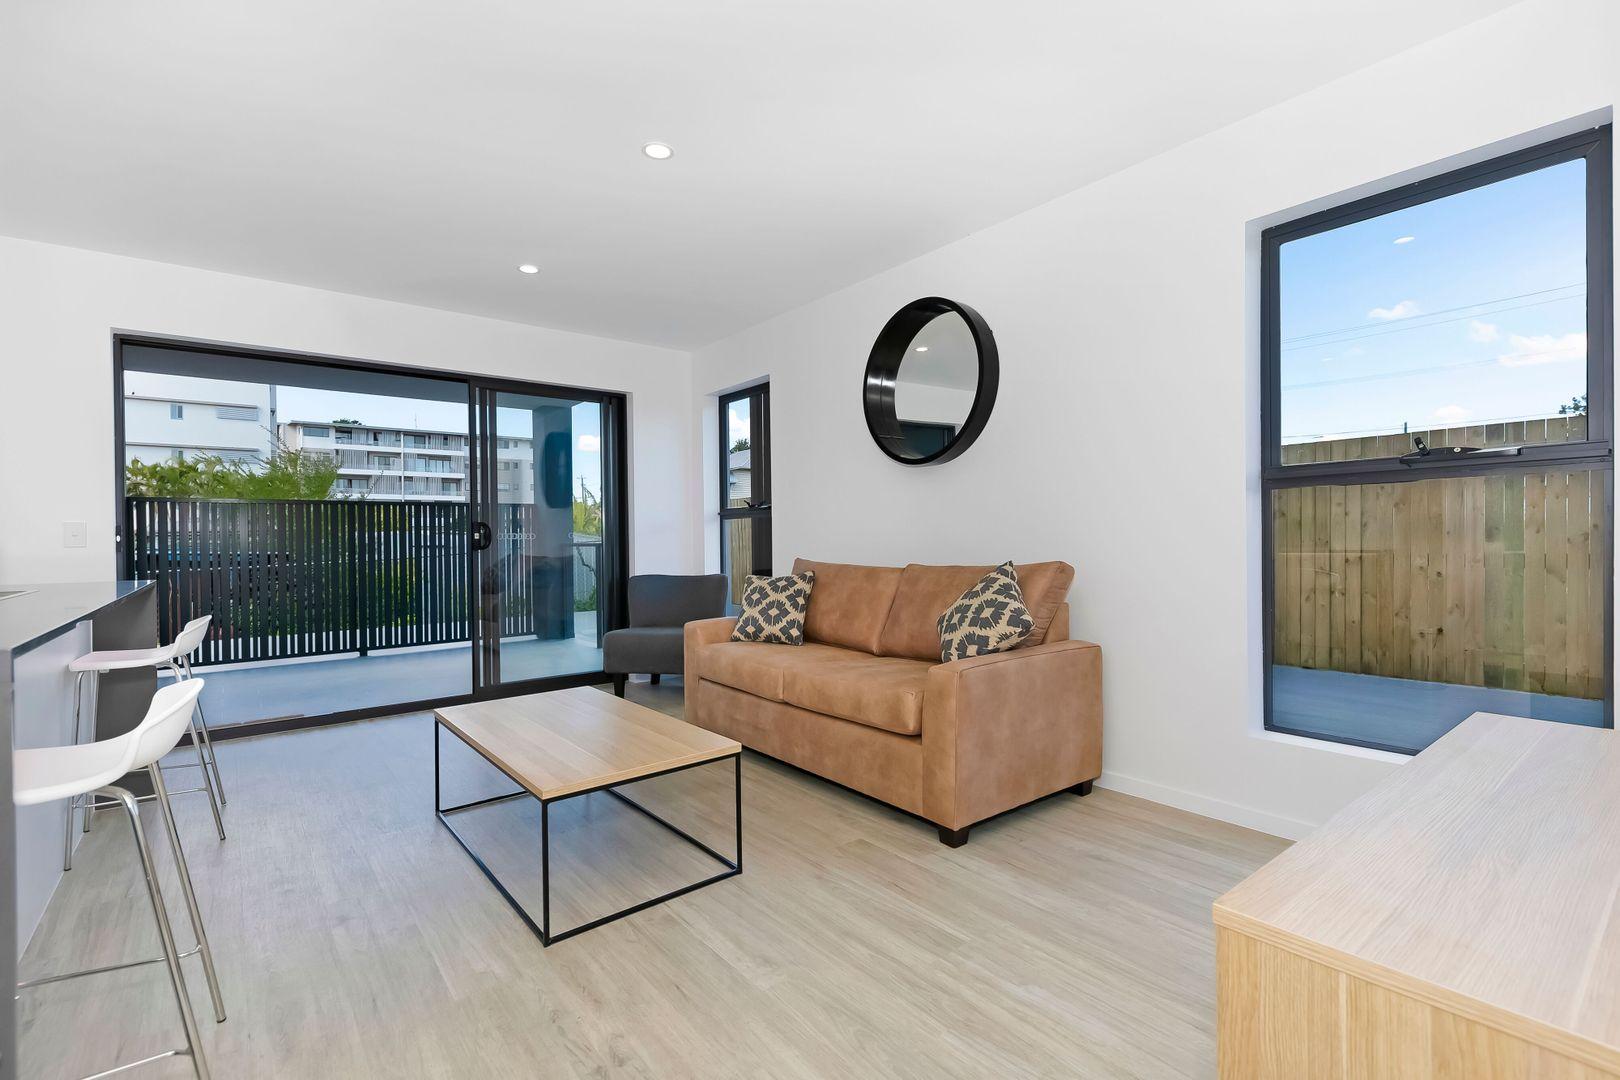 19/27 Lumley Street, Upper Mount Gravatt QLD 4122, Image 0